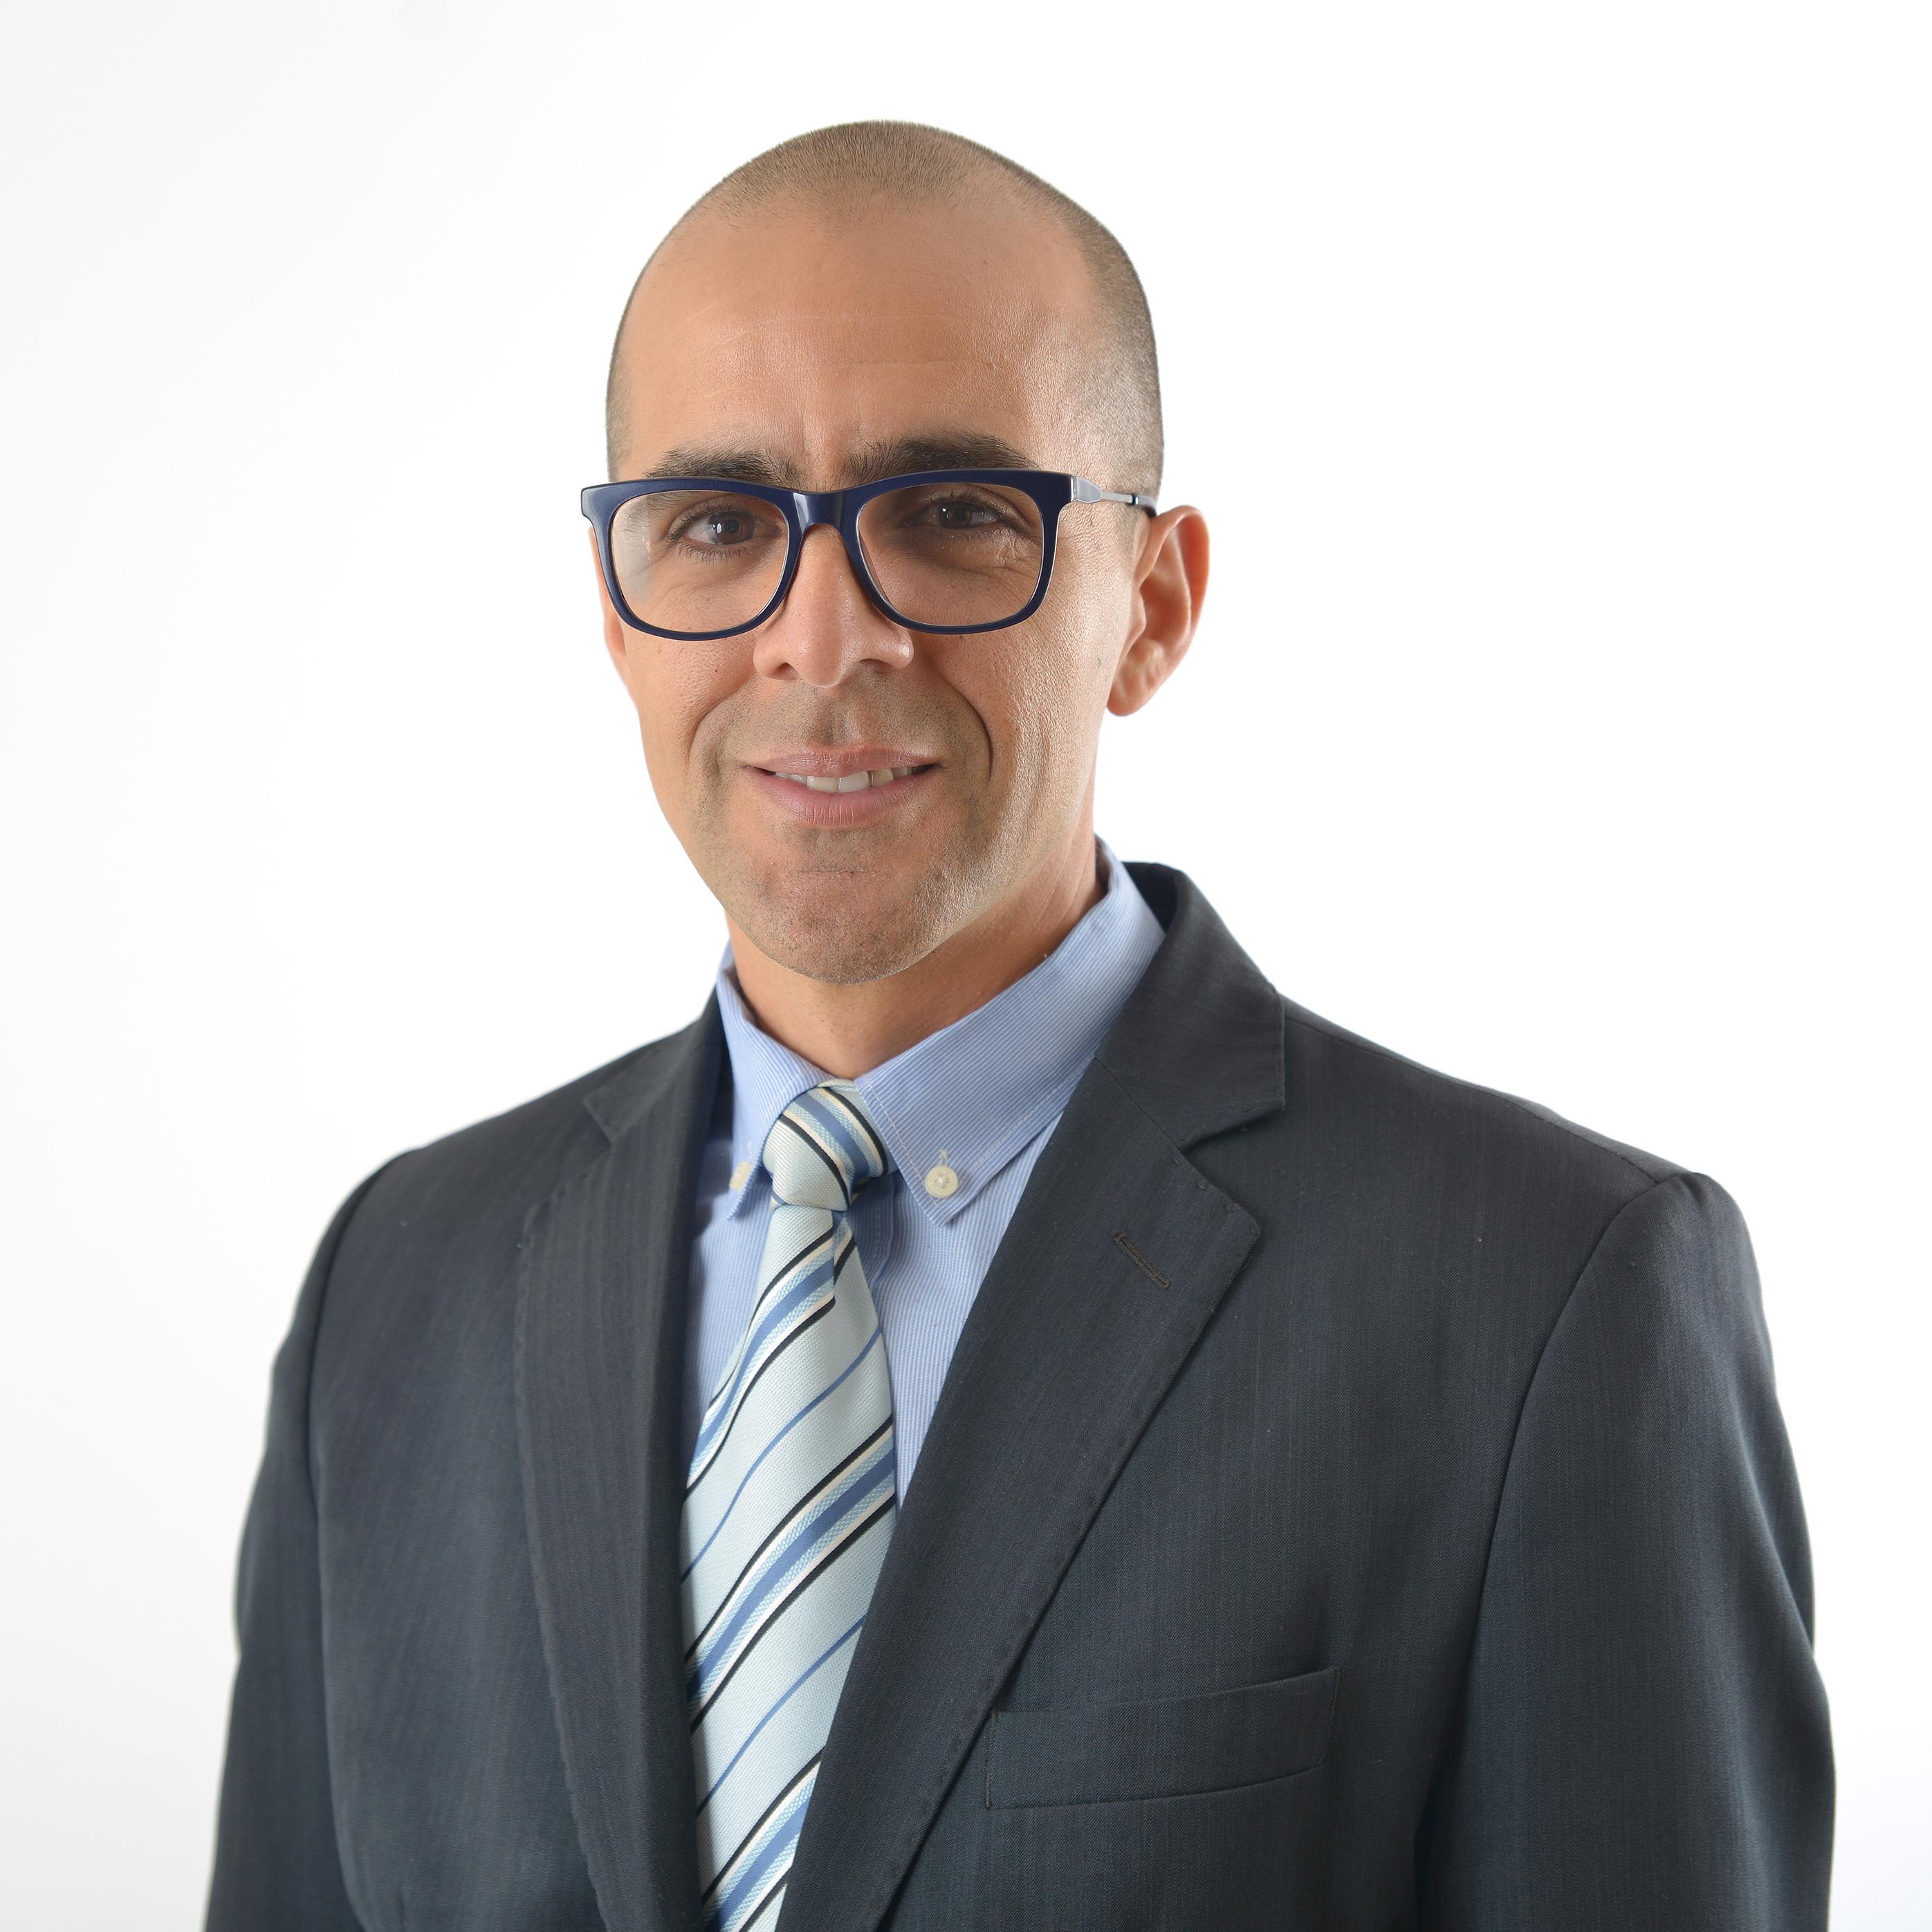 Jaime Jose Calixto